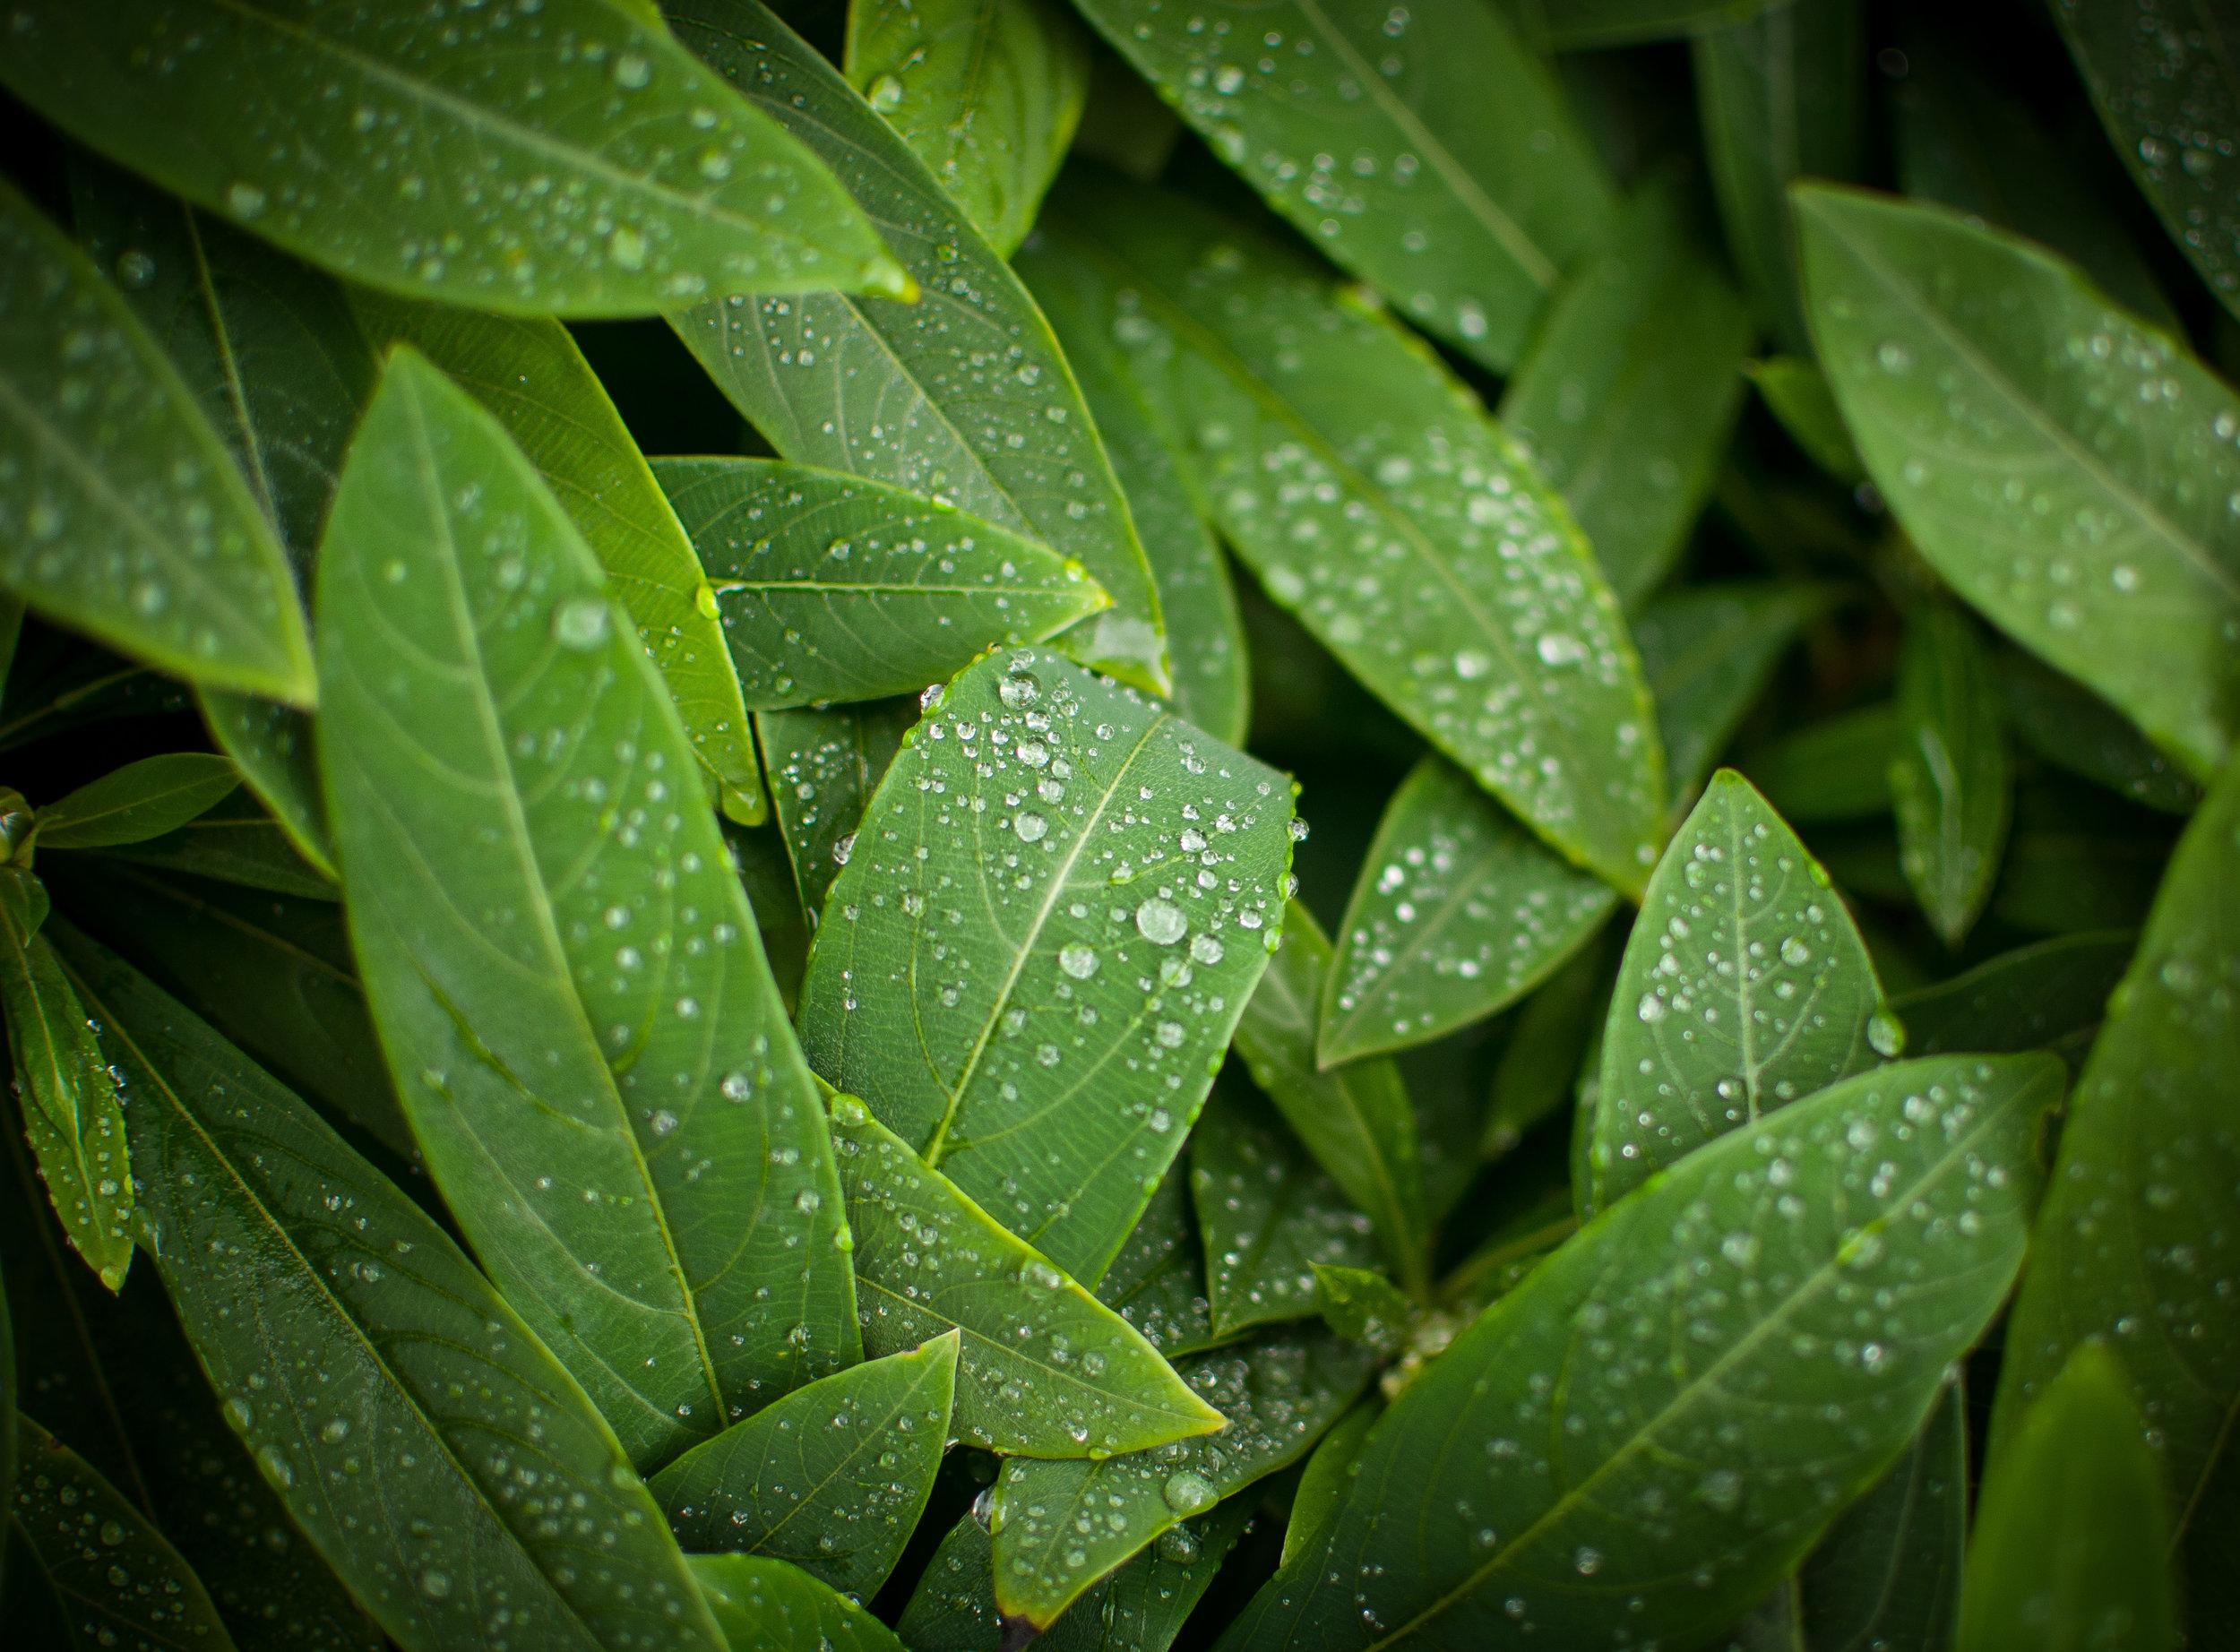 Water Droplets  Camera: Nikon D90 Shutter speed: 1/160 sec Aperture: f/1.8 ISO: 200 Photo: Jeff Carlson